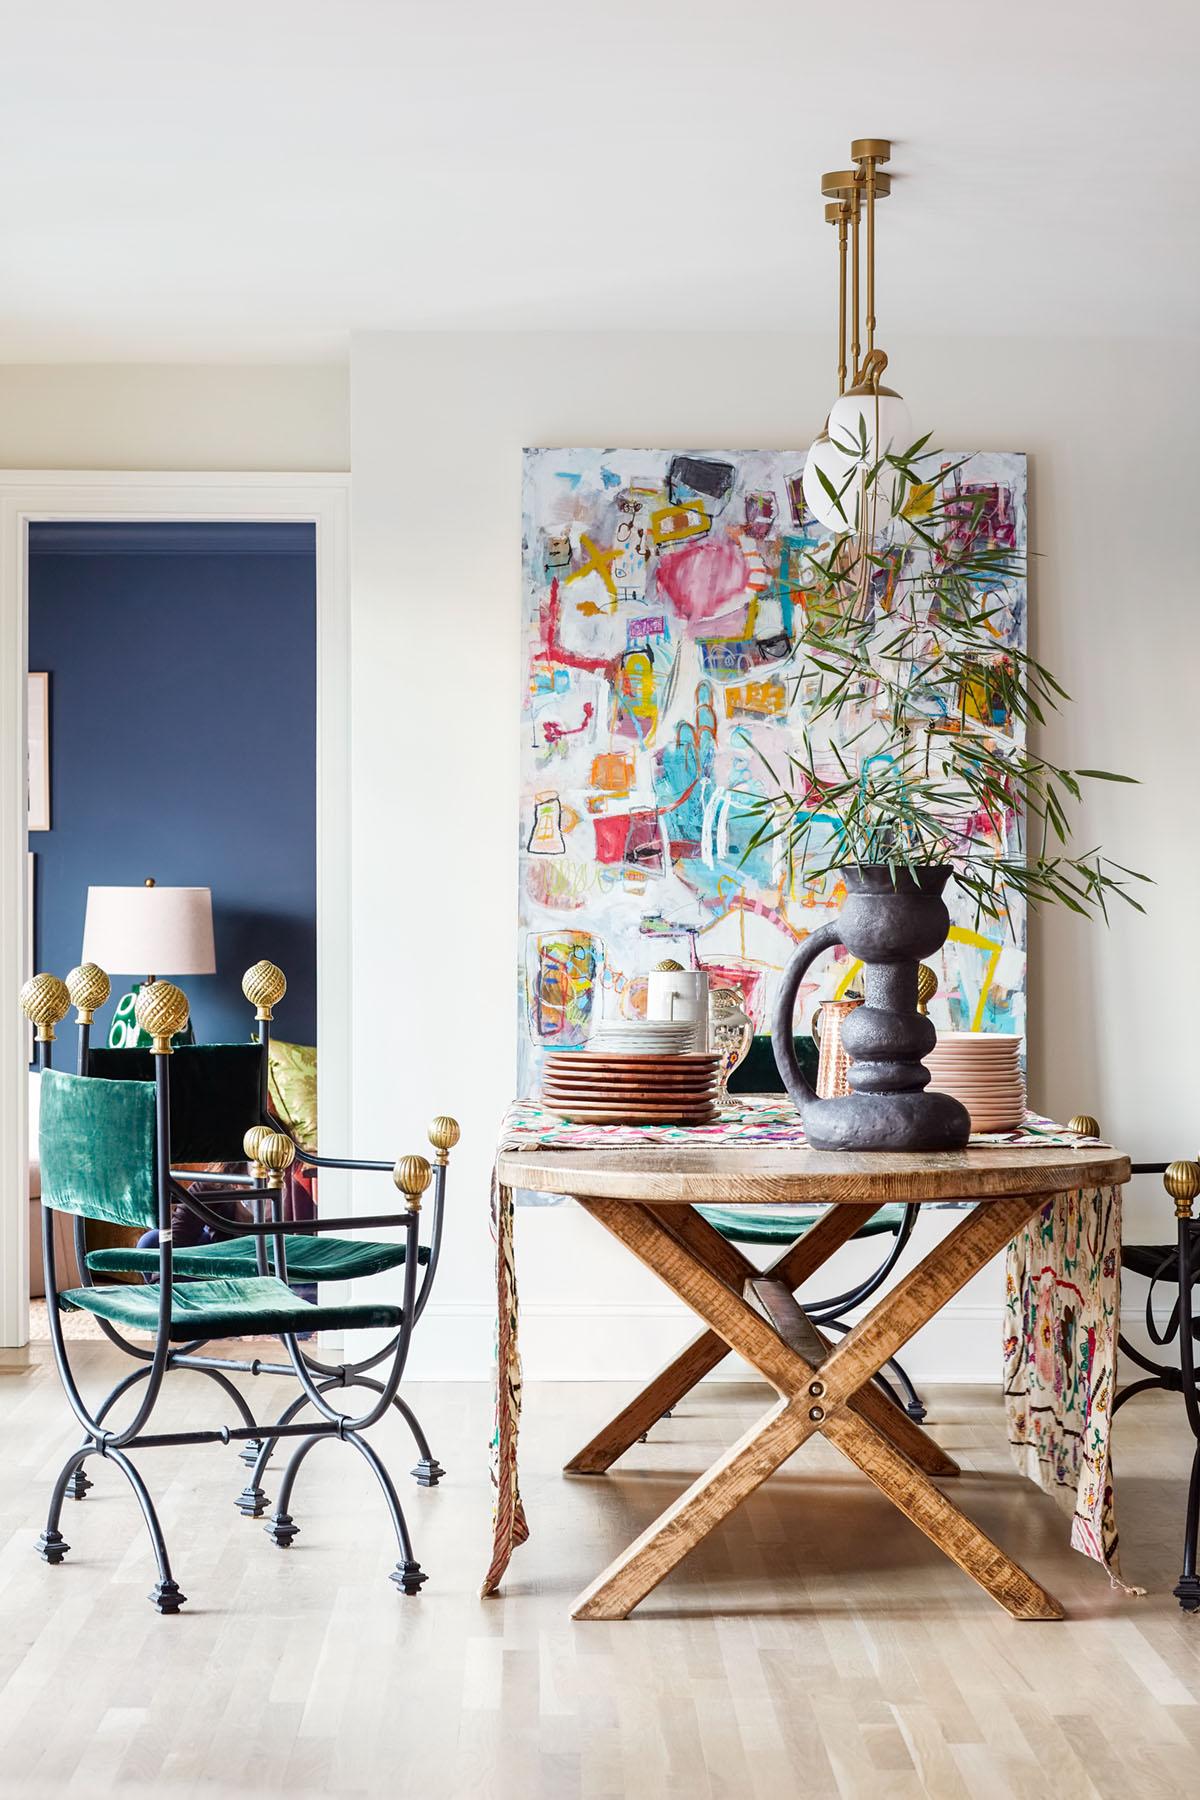 dining room by interior designer Janie Molster